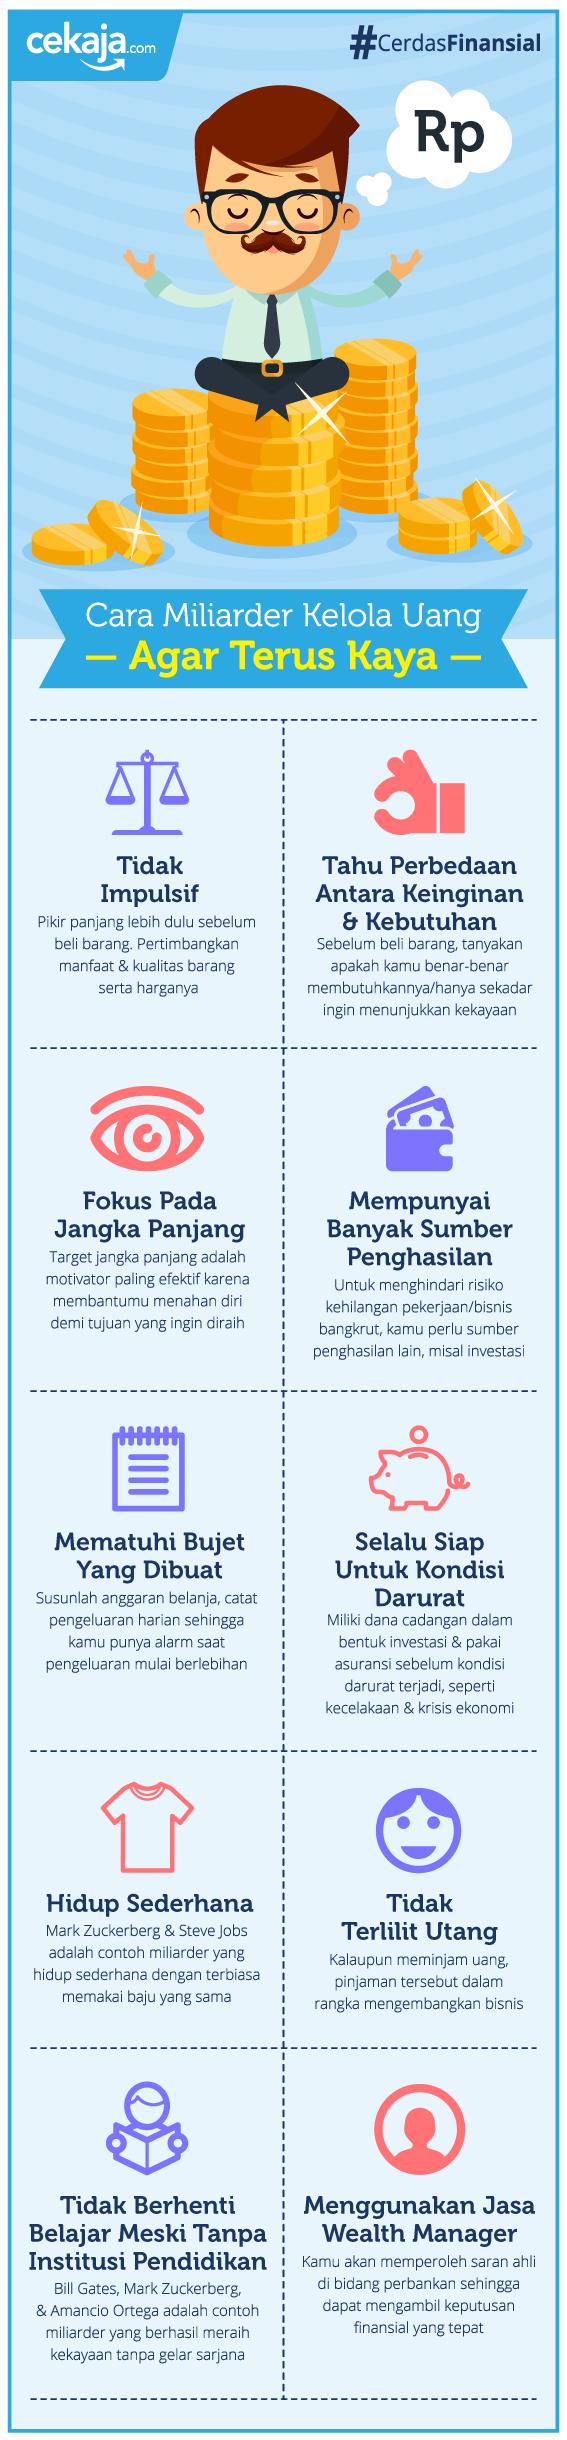 infografis-cara miliarder kelola uang - CekAja.com